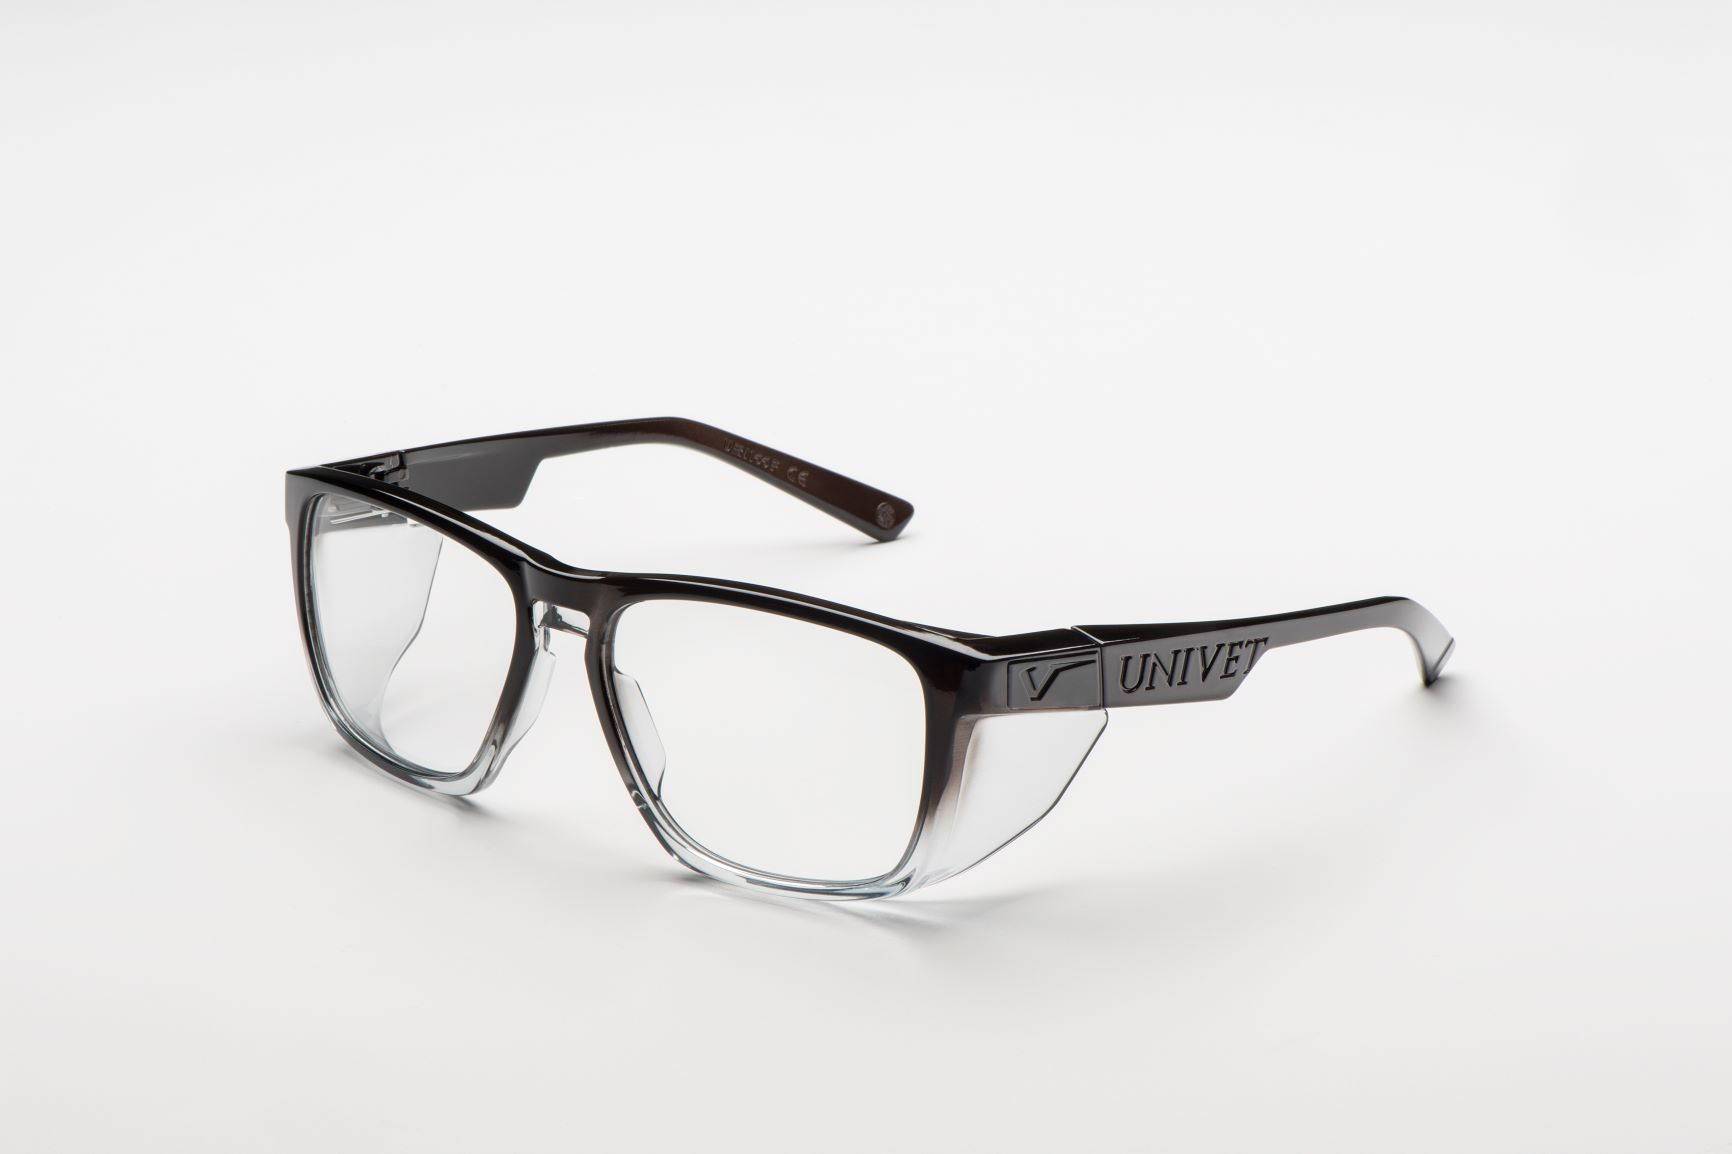 Univet spatbril op sterkte